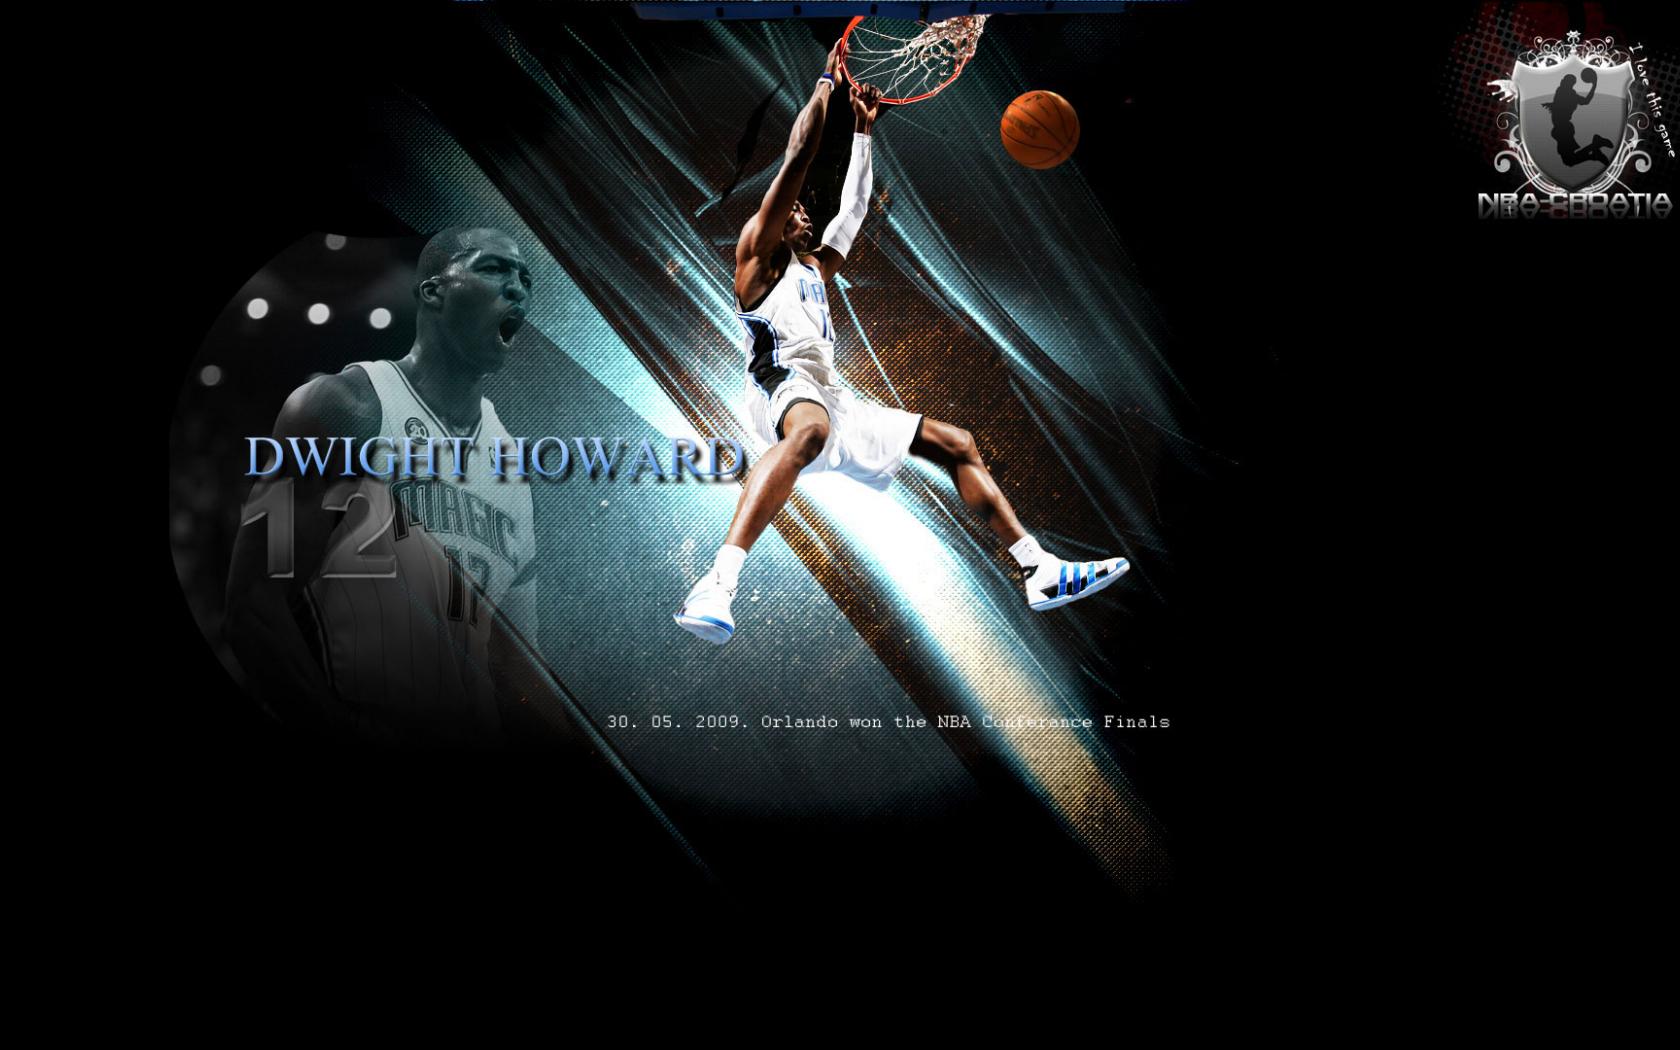 Free Download Champions Magic Howard Dwight Sports Basketball